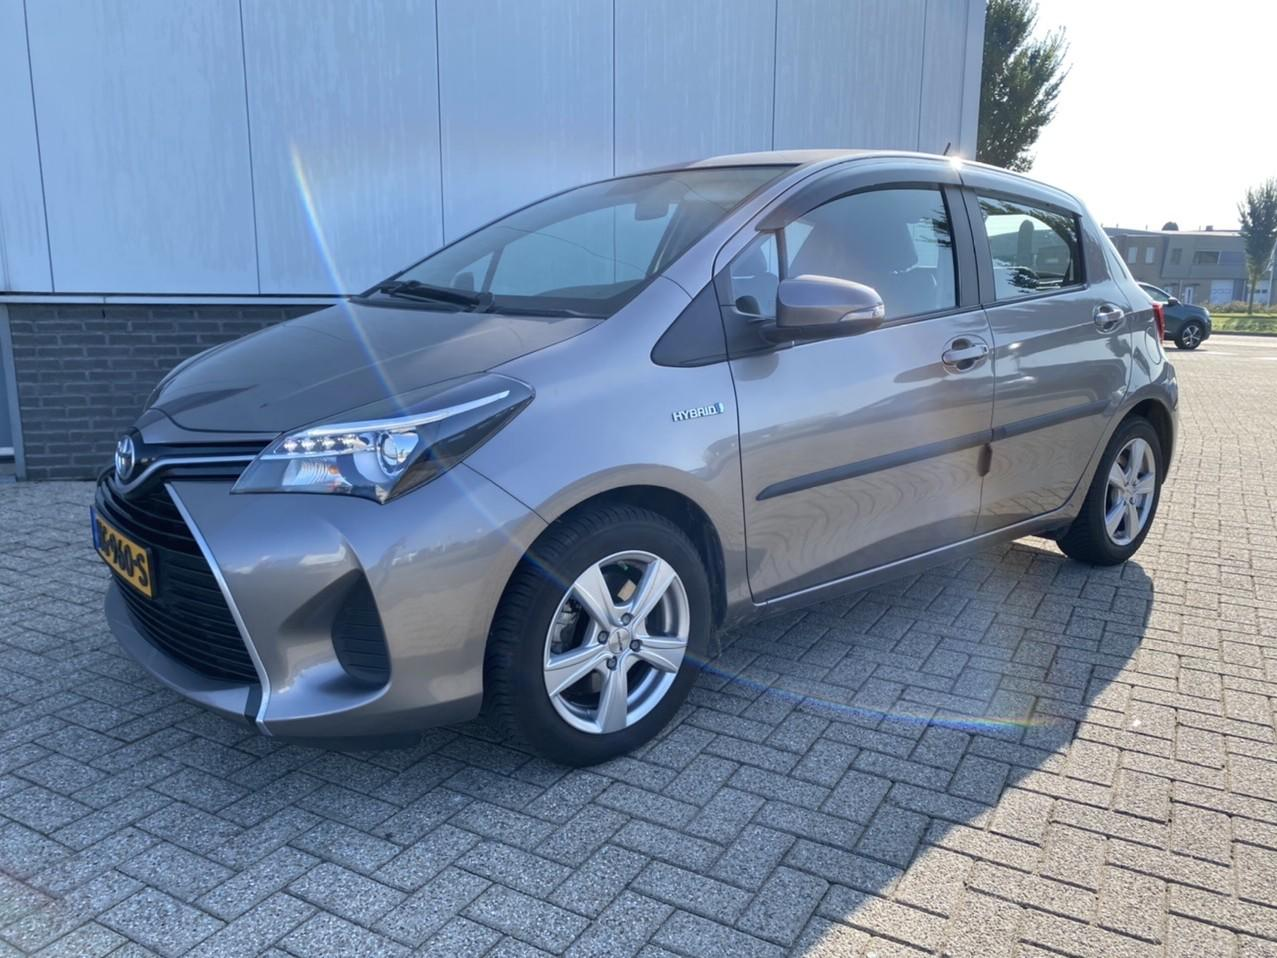 Toyota Yaris 1.5 full hybrid 100pk 5d aut aspiration rijklaar prijs